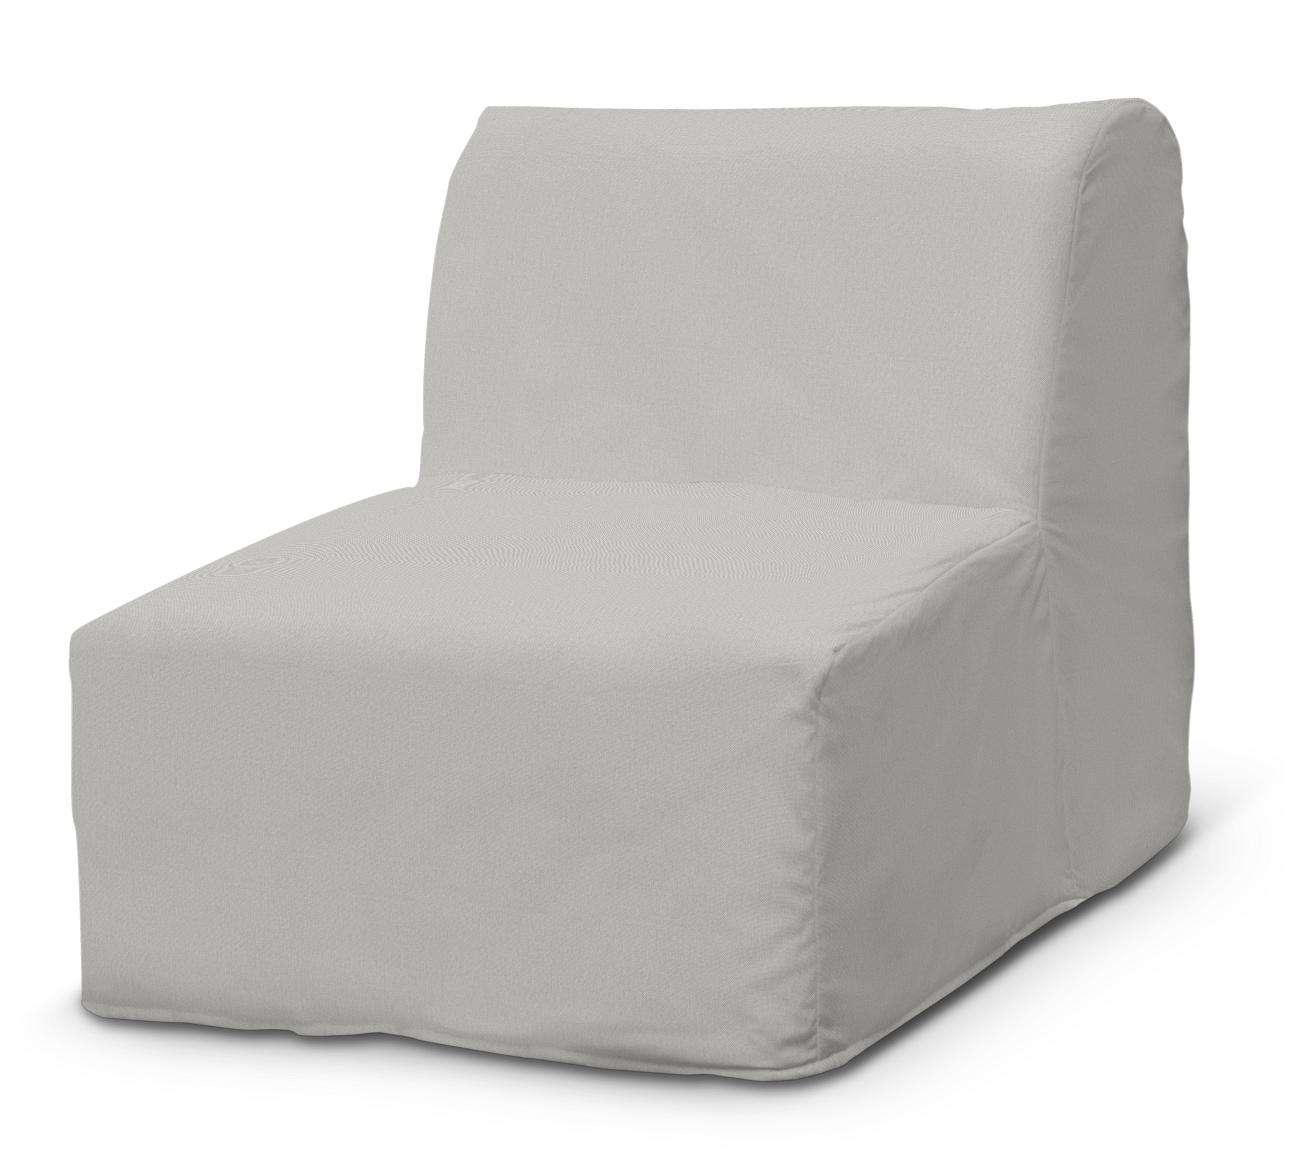 Pokrowiec na fotel Lycksele prosty fotel Lycksele w kolekcji Etna , tkanina: 705-90